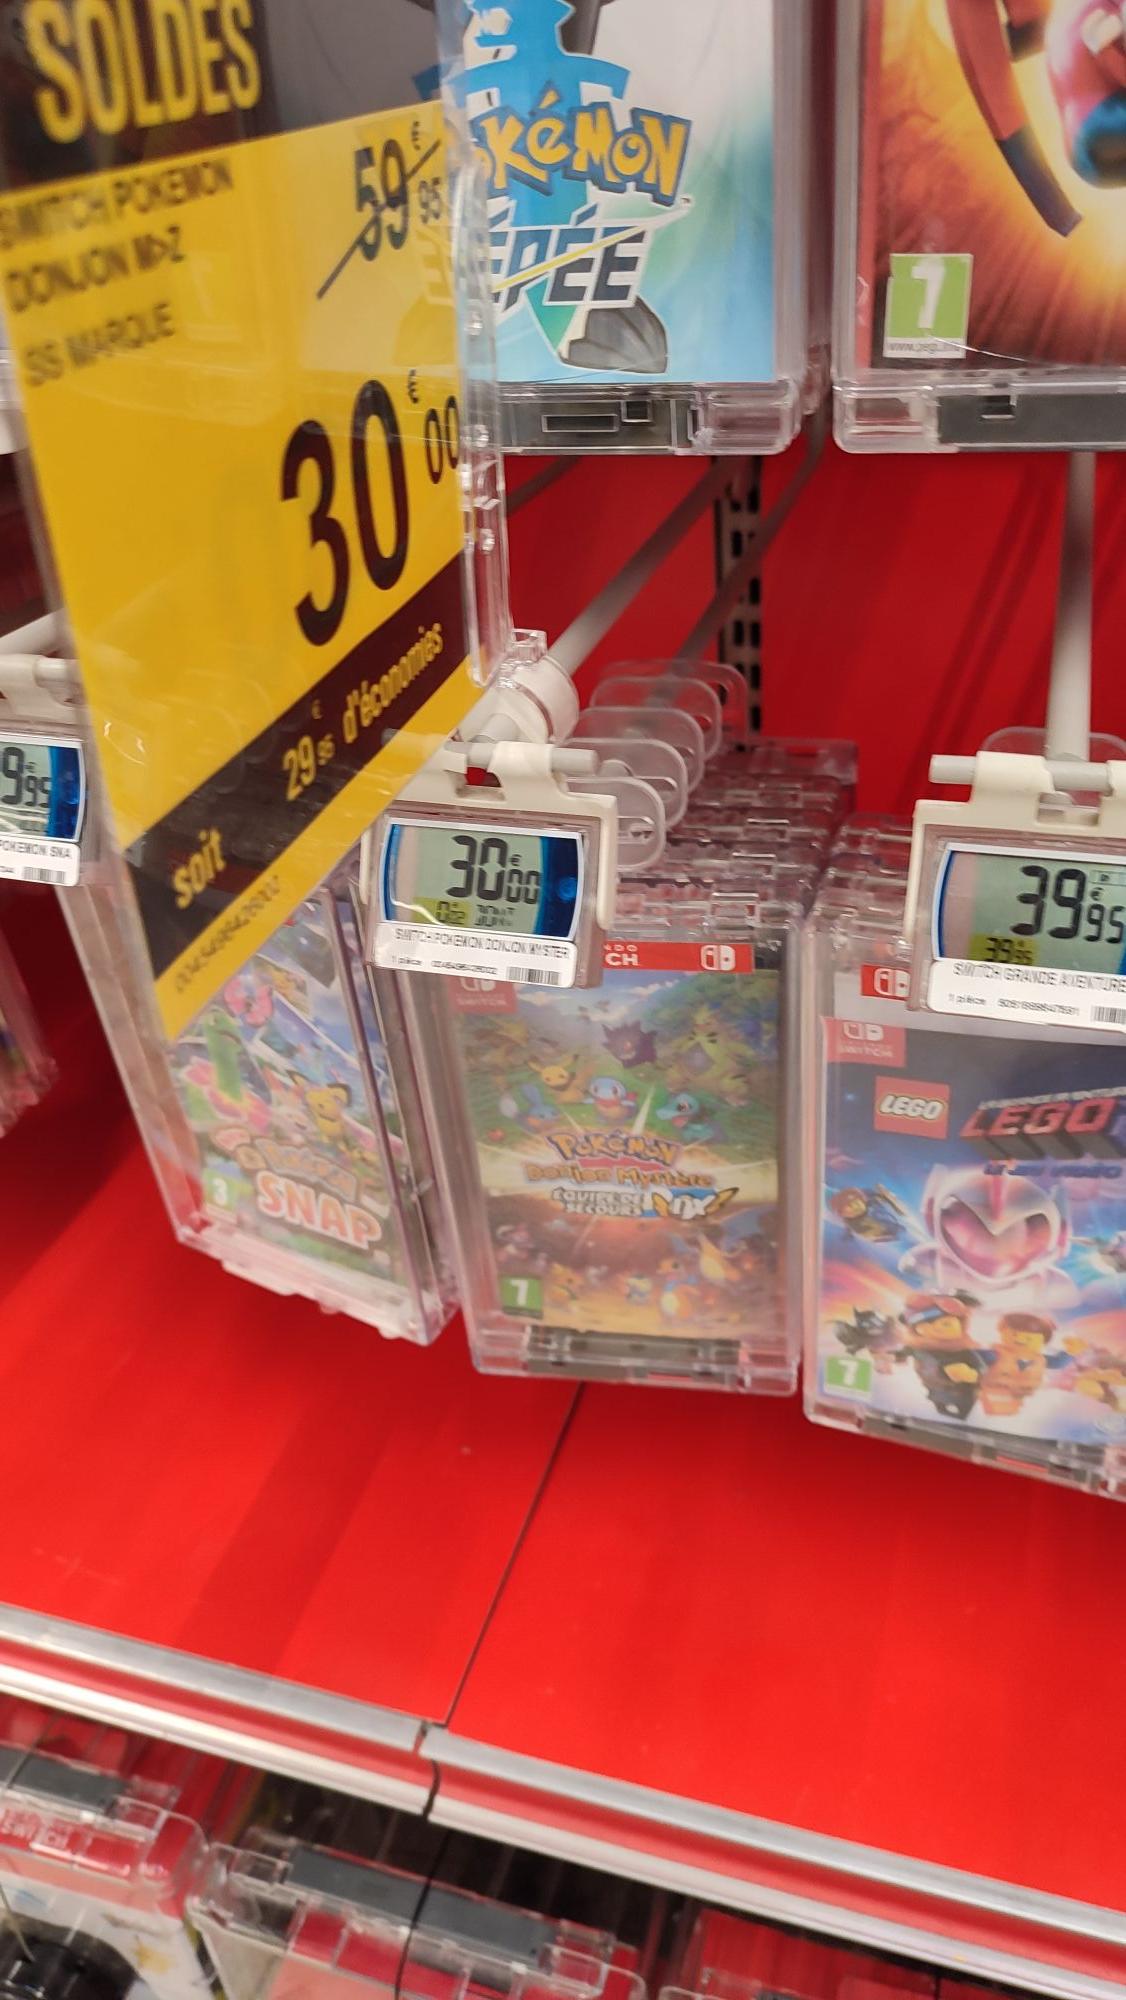 Pokémon Donjon mystère sur Nintendo Switch - La Beaujoire (44)